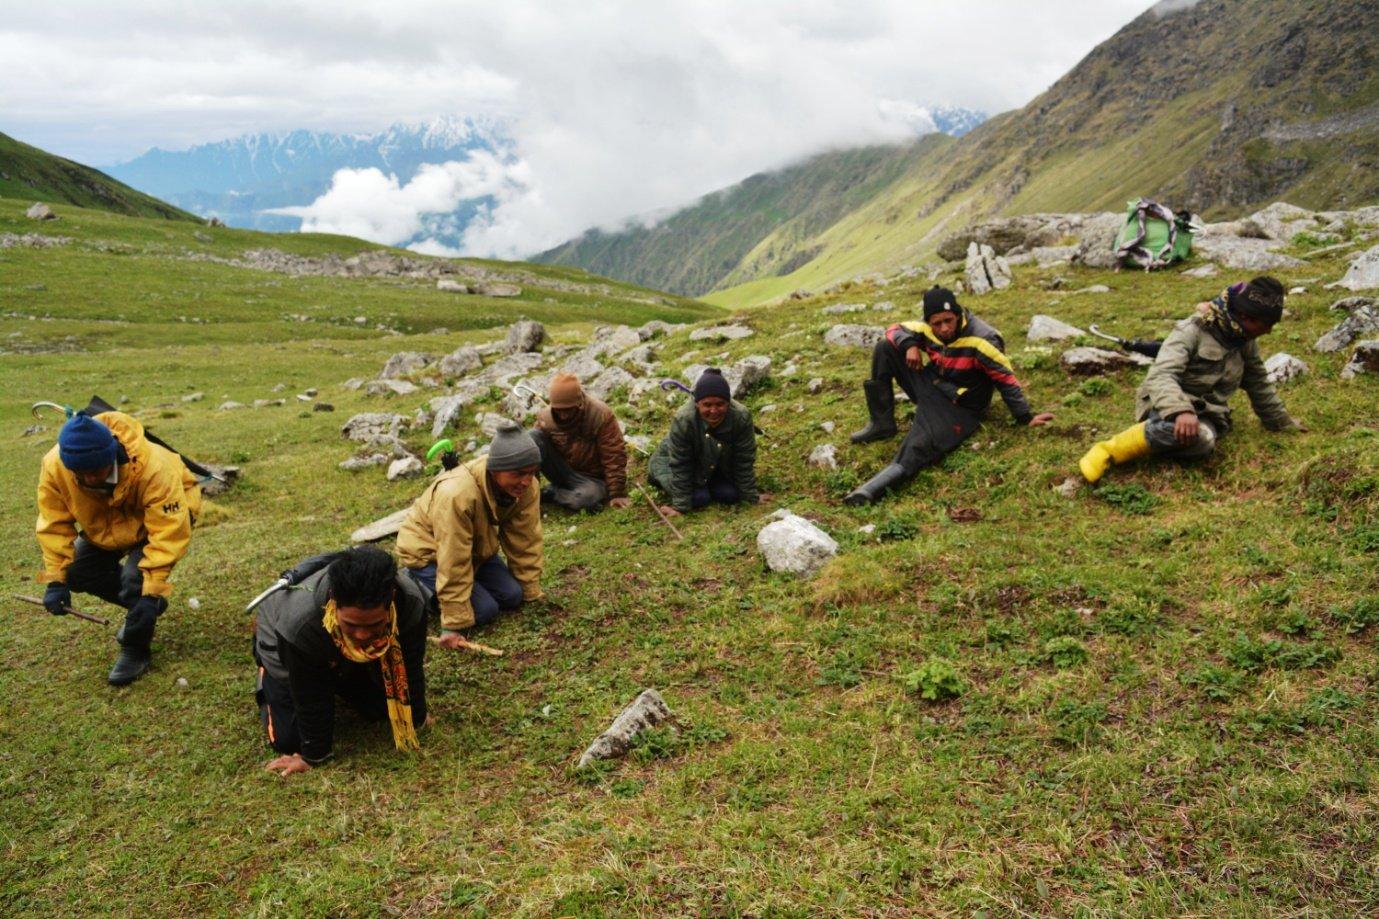 Himalayan viagra, Harvesting of caterpillar fungus in Askot in Uttarakhand state, Western Himalayas (Photo by Muzamil Ahmad)